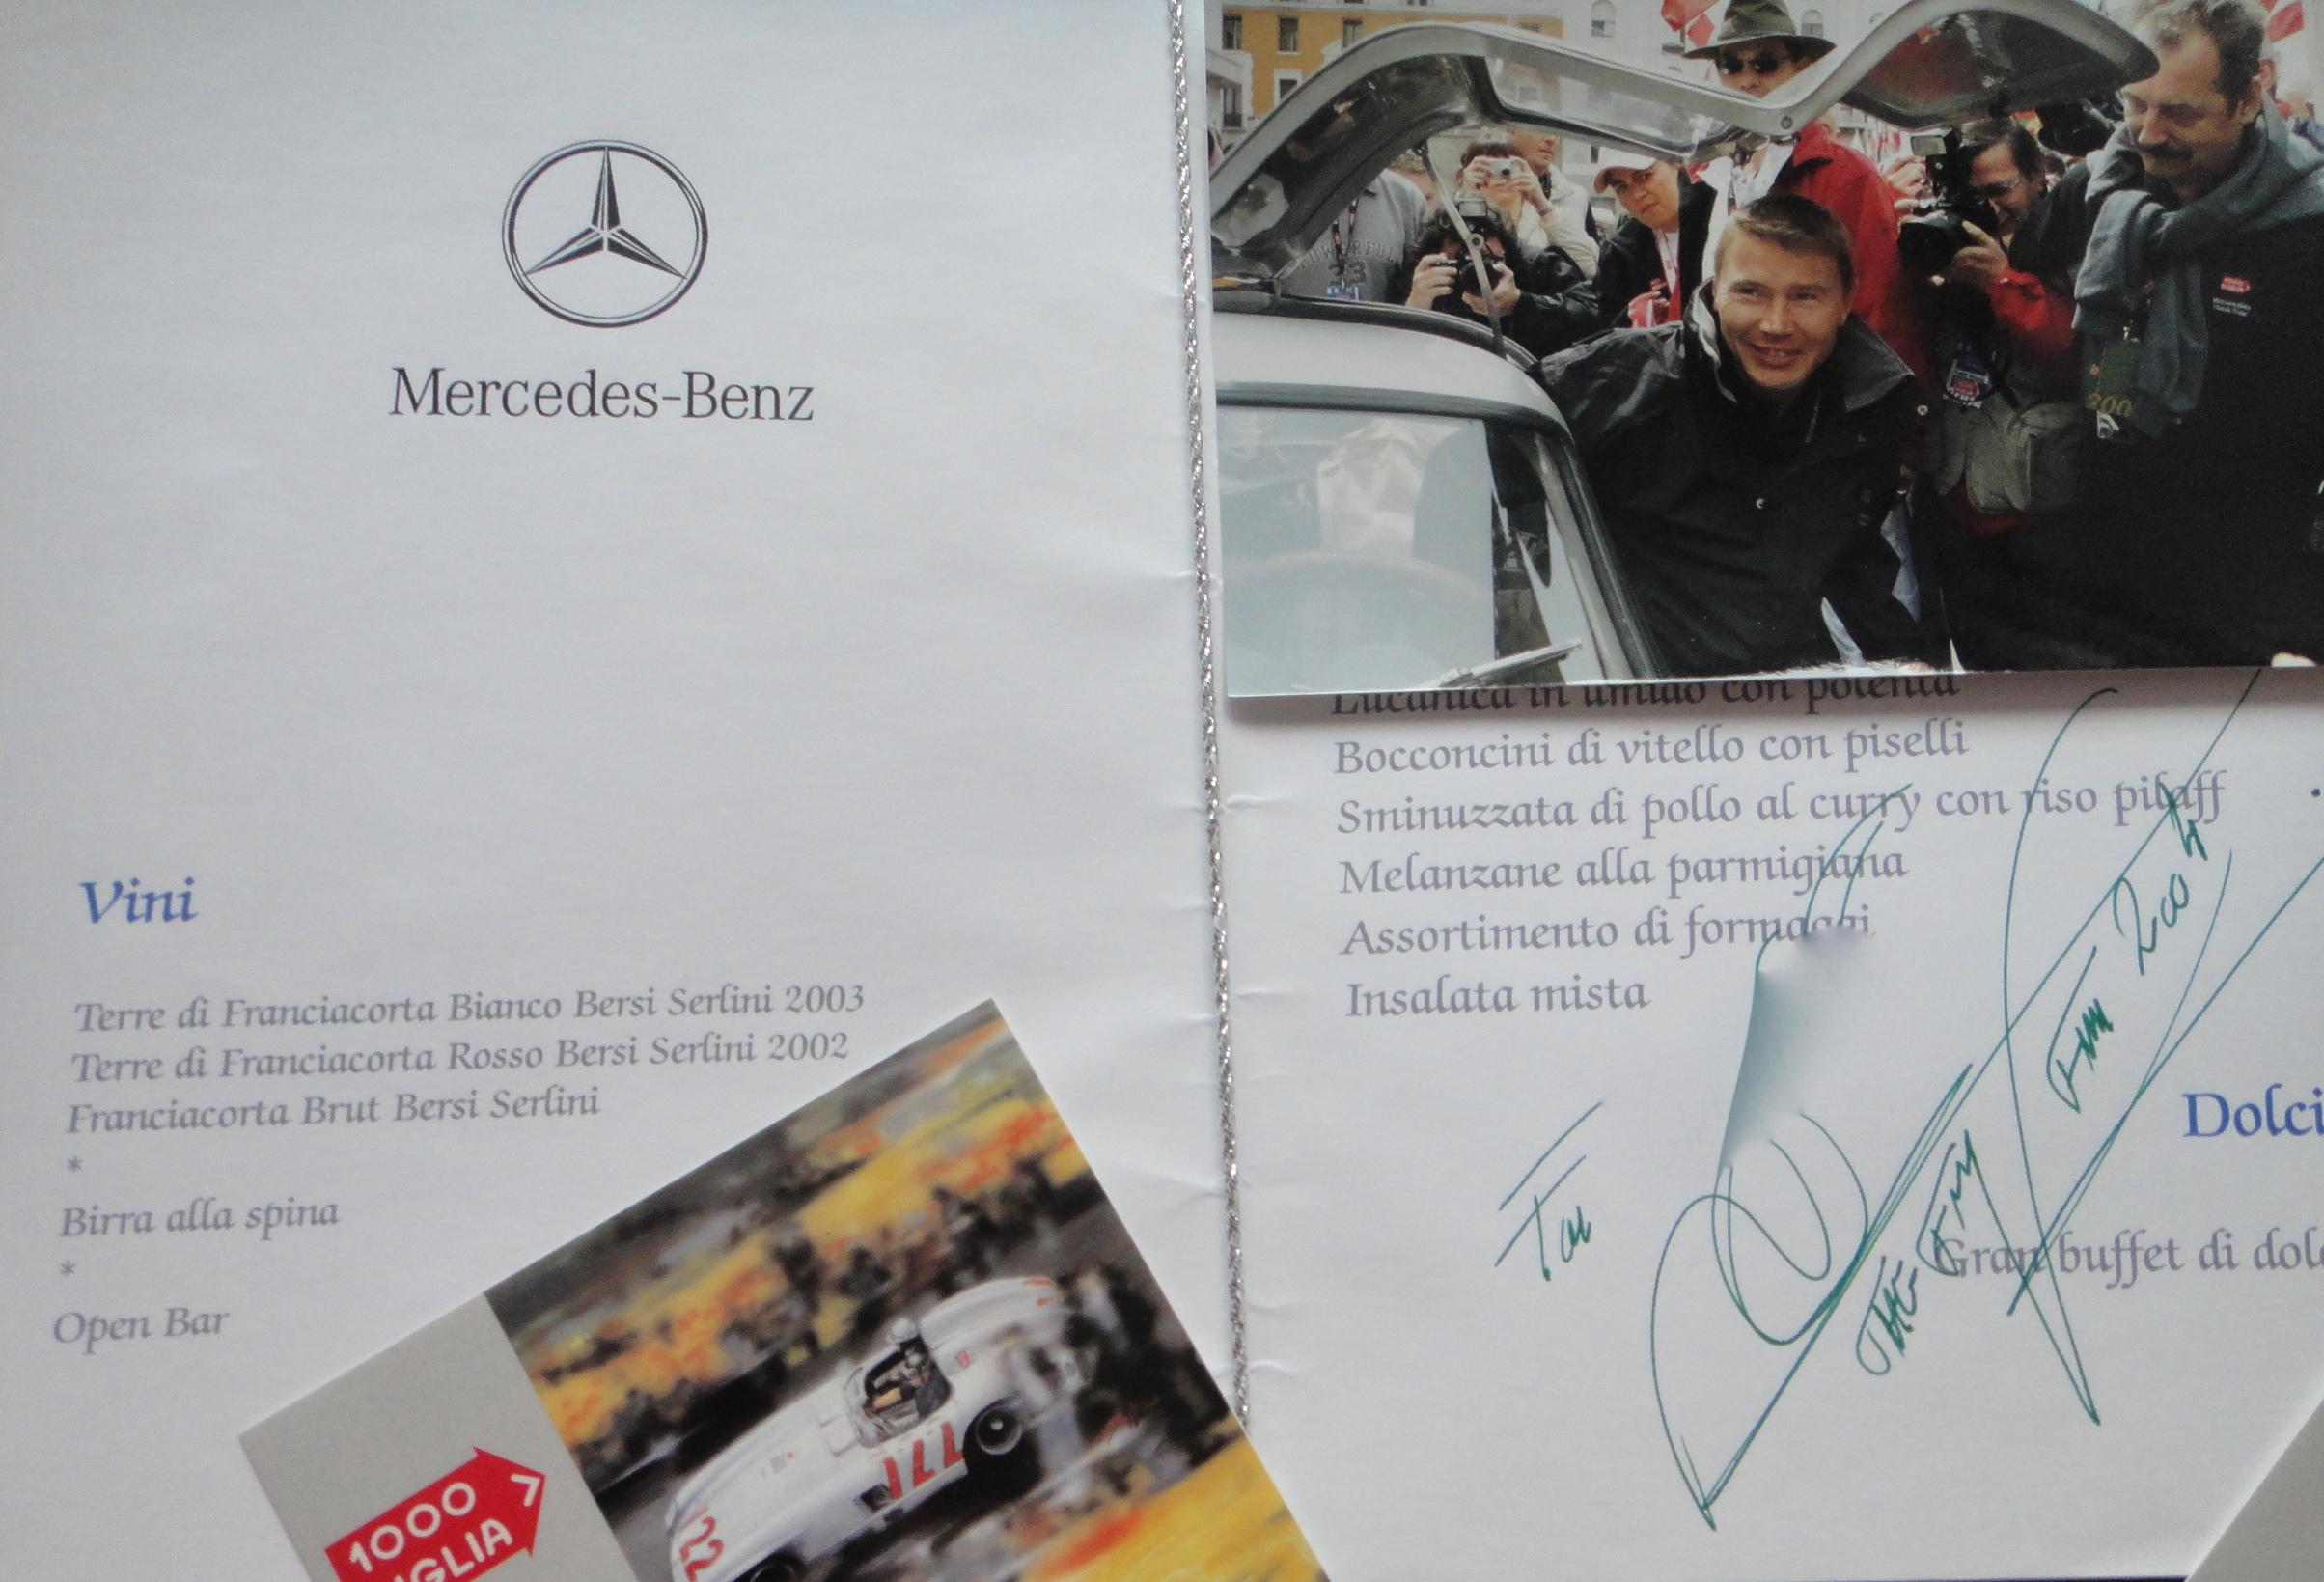 Mille Miglia menue & Mika Häkkinen autograph